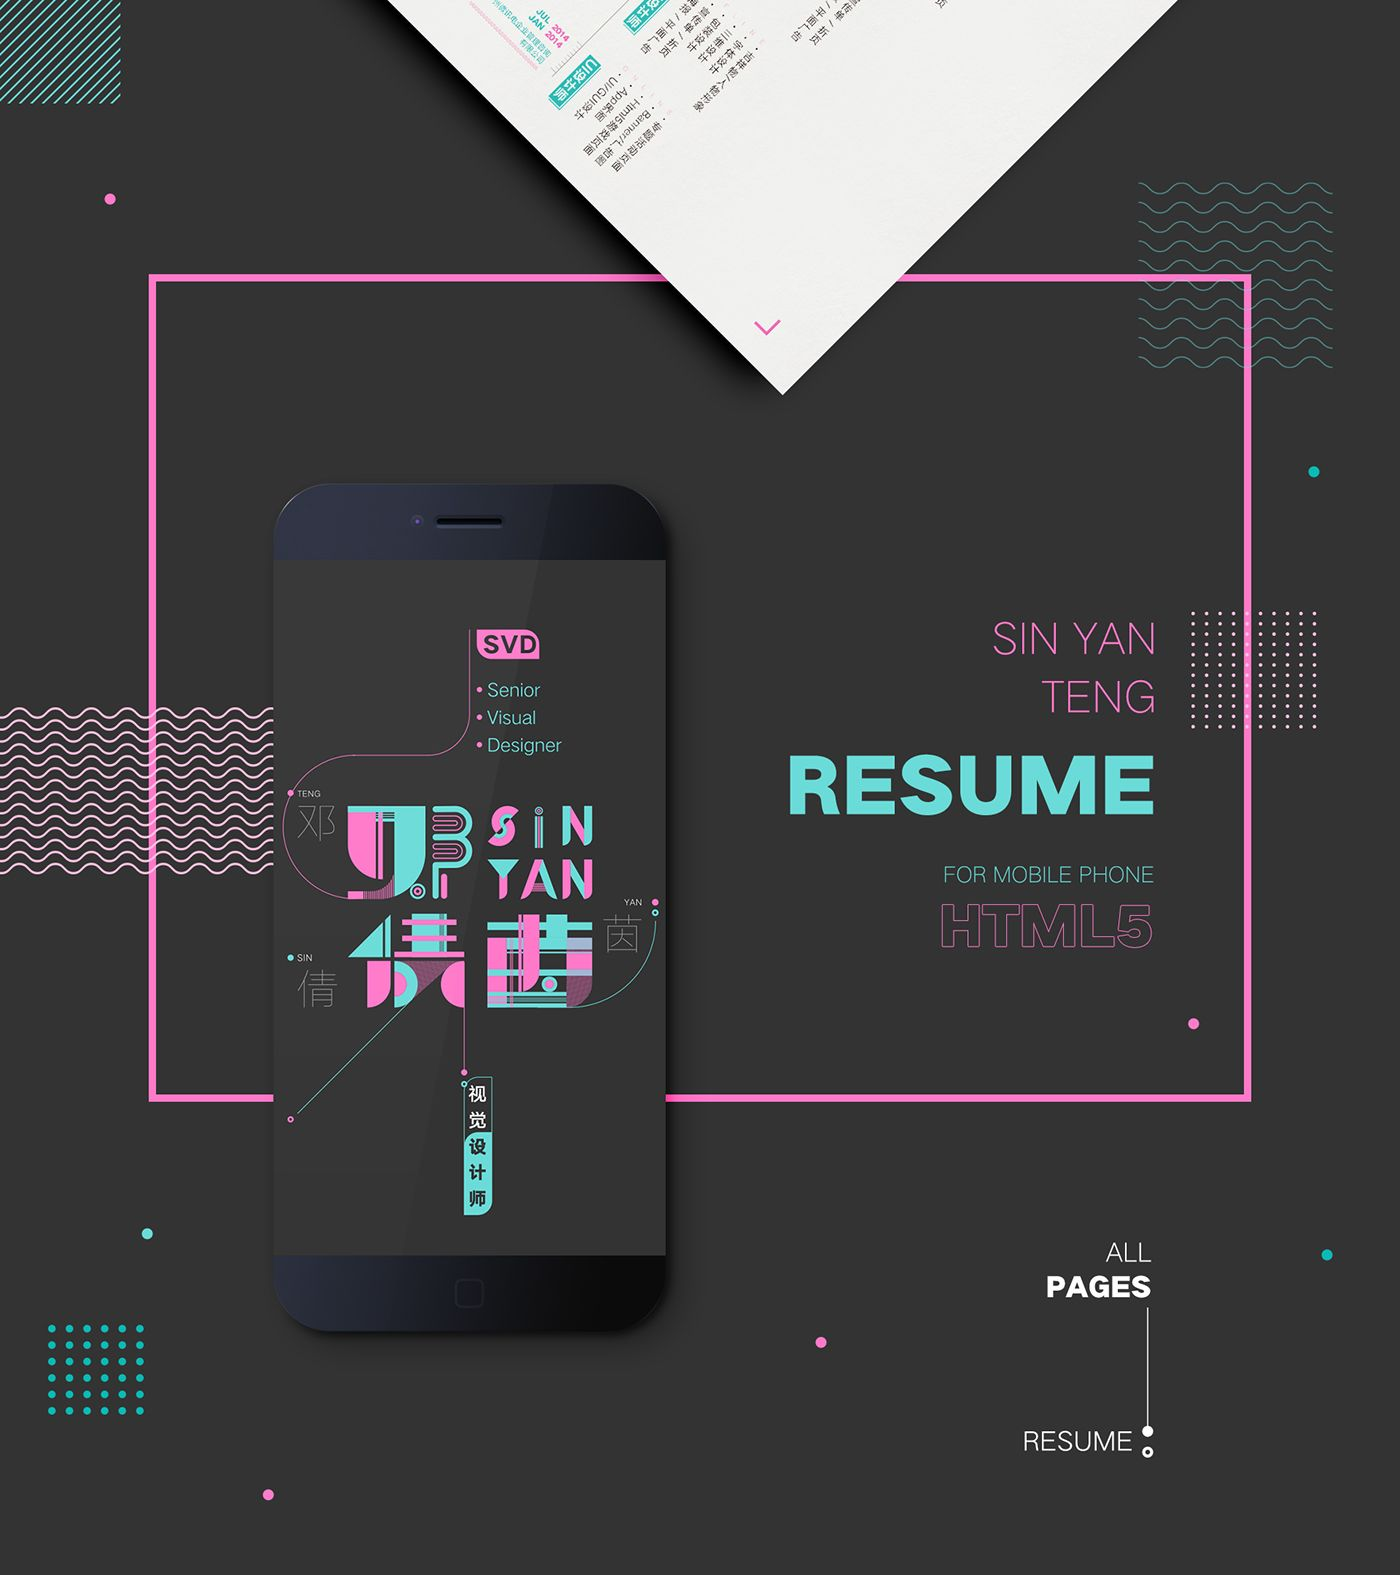 fashion merchandising resume%0A Resume design on Behance